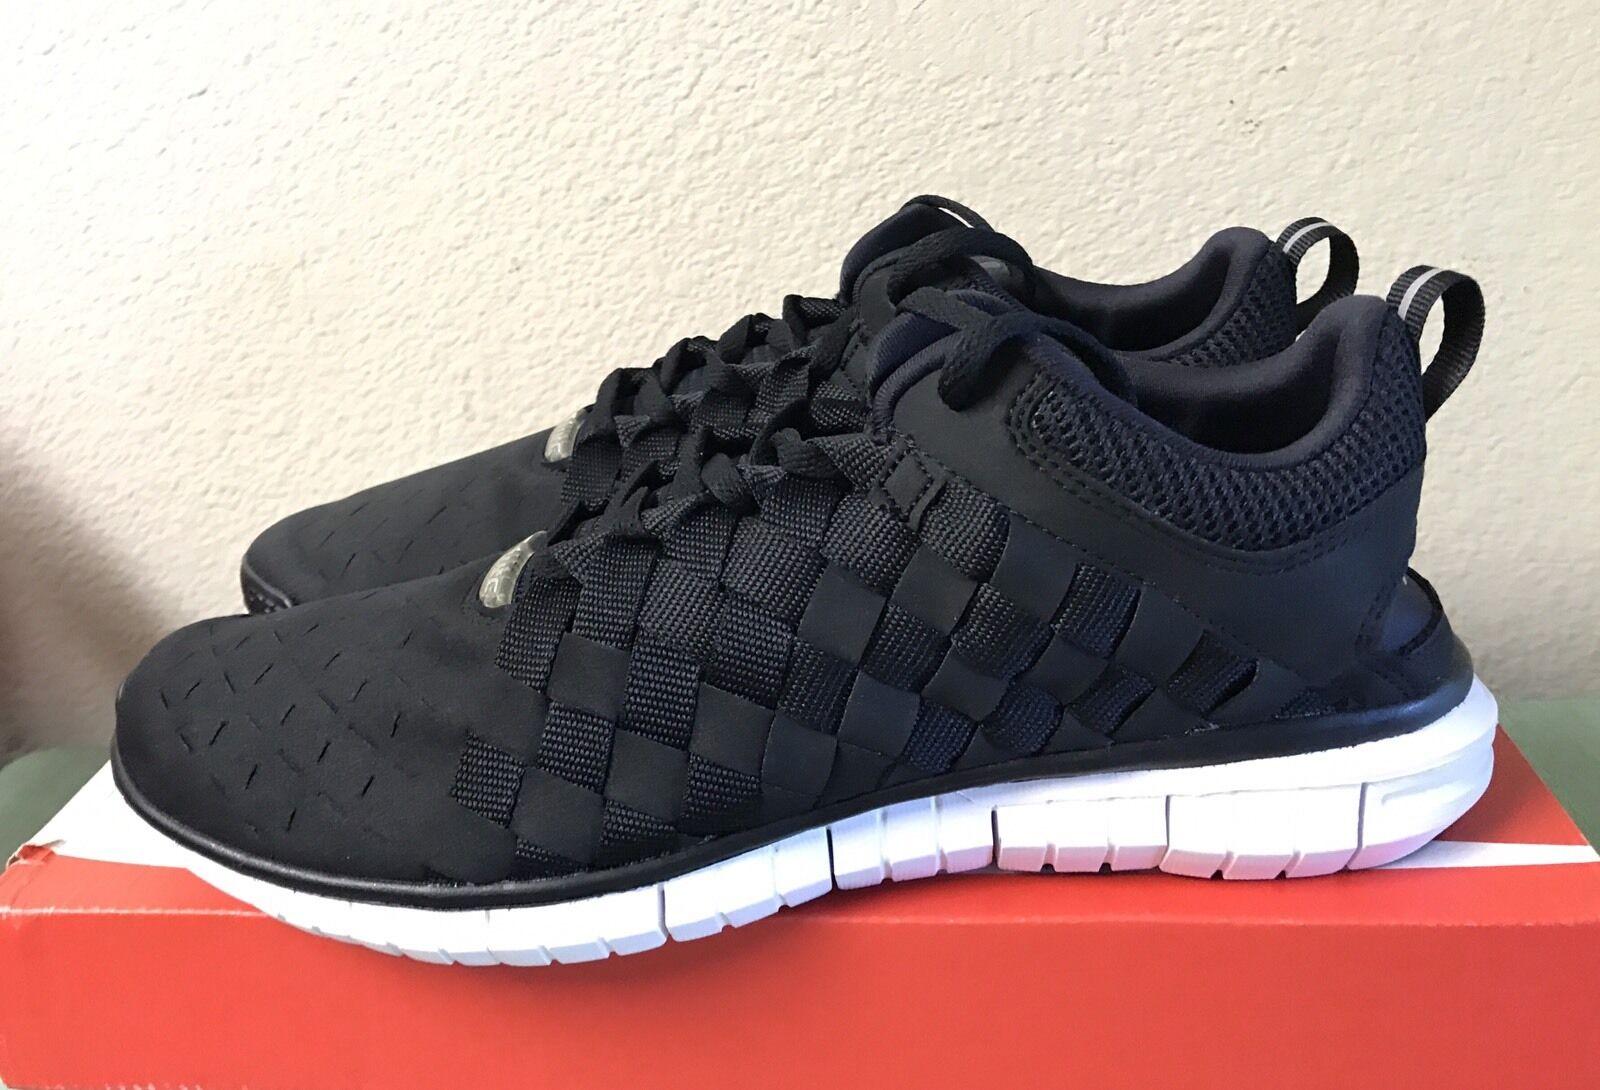 Nike Free OG '14 Woven Black Cool Grey White Mens Sz 9 QS Running Shoes NEW!!!